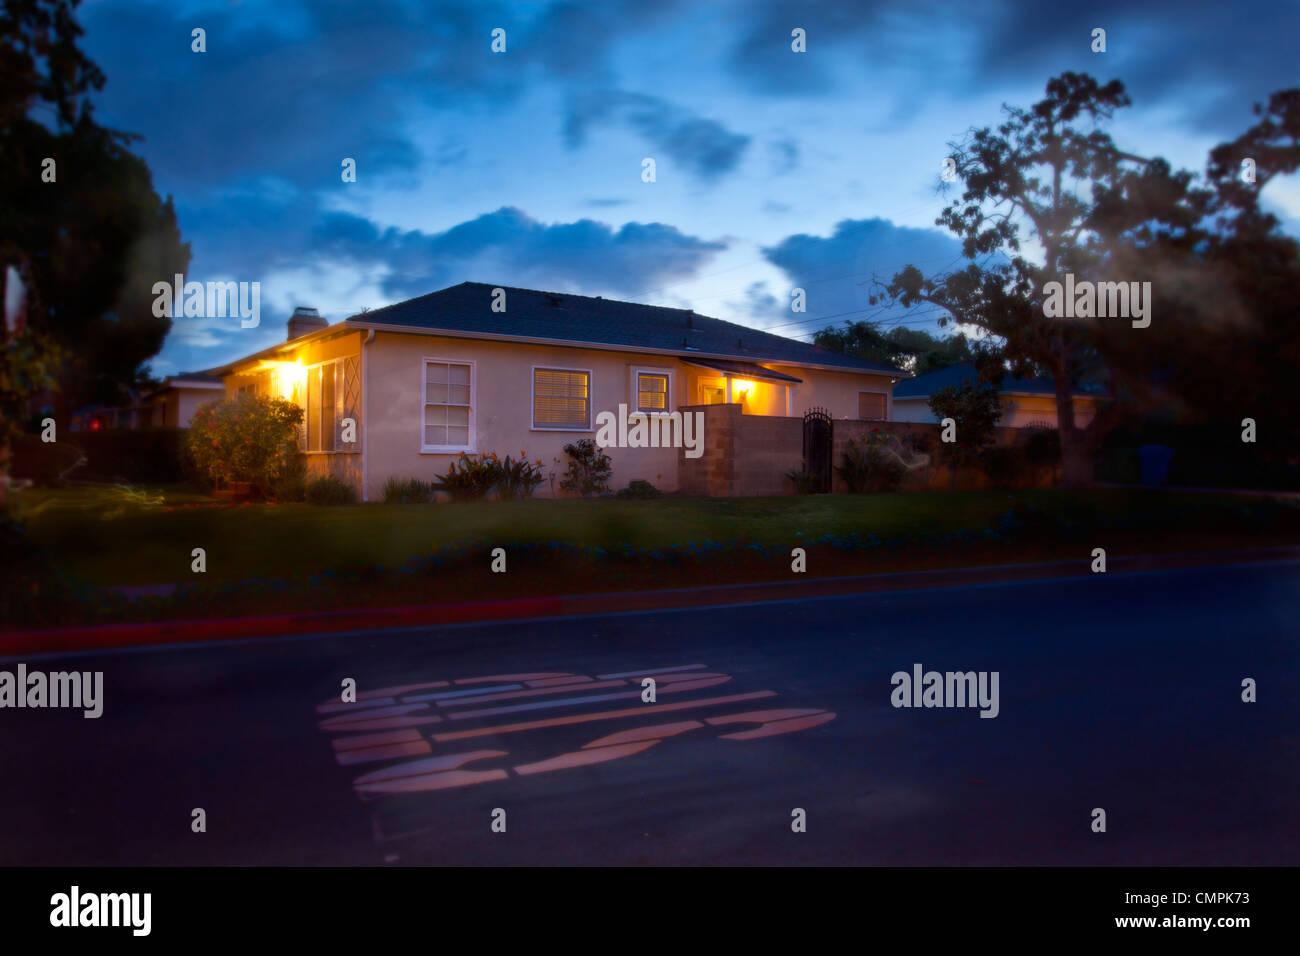 House, Culver City, Los Angeles, California, USA - Stock Image